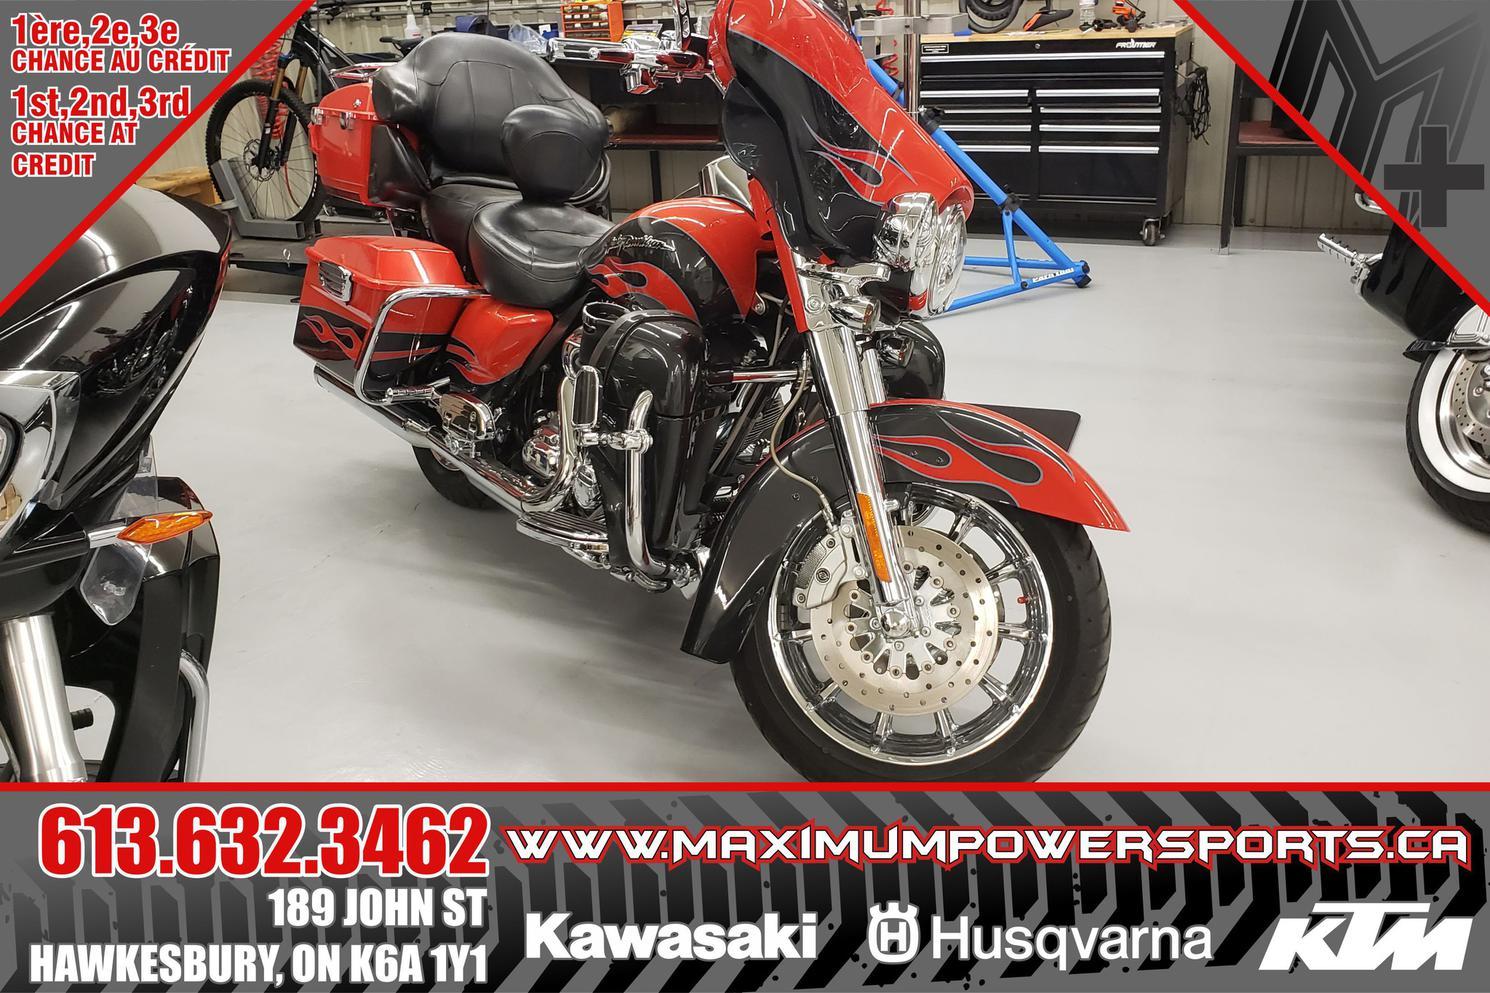 2010 Harley-Davidson FLHTC